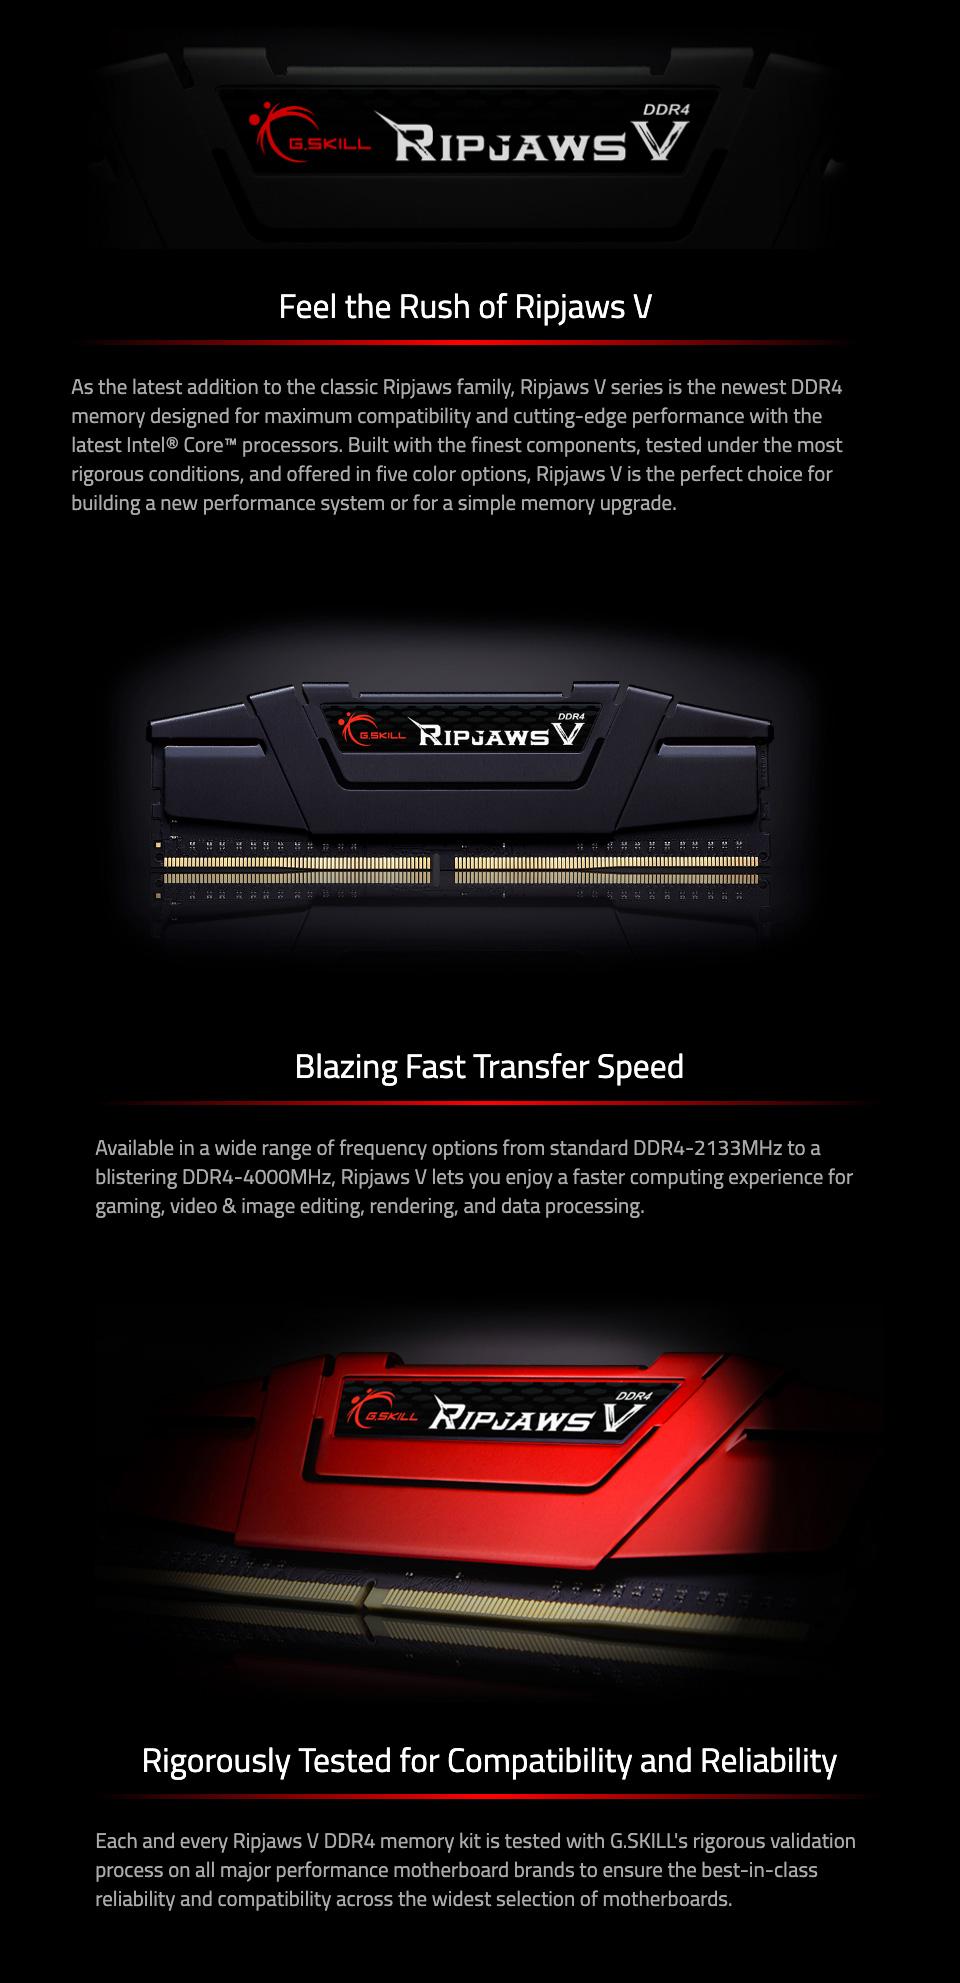 G.Skill Ripjaws V F4-3600C18D-32GVK 32GB (2x16GB) DDR4 features